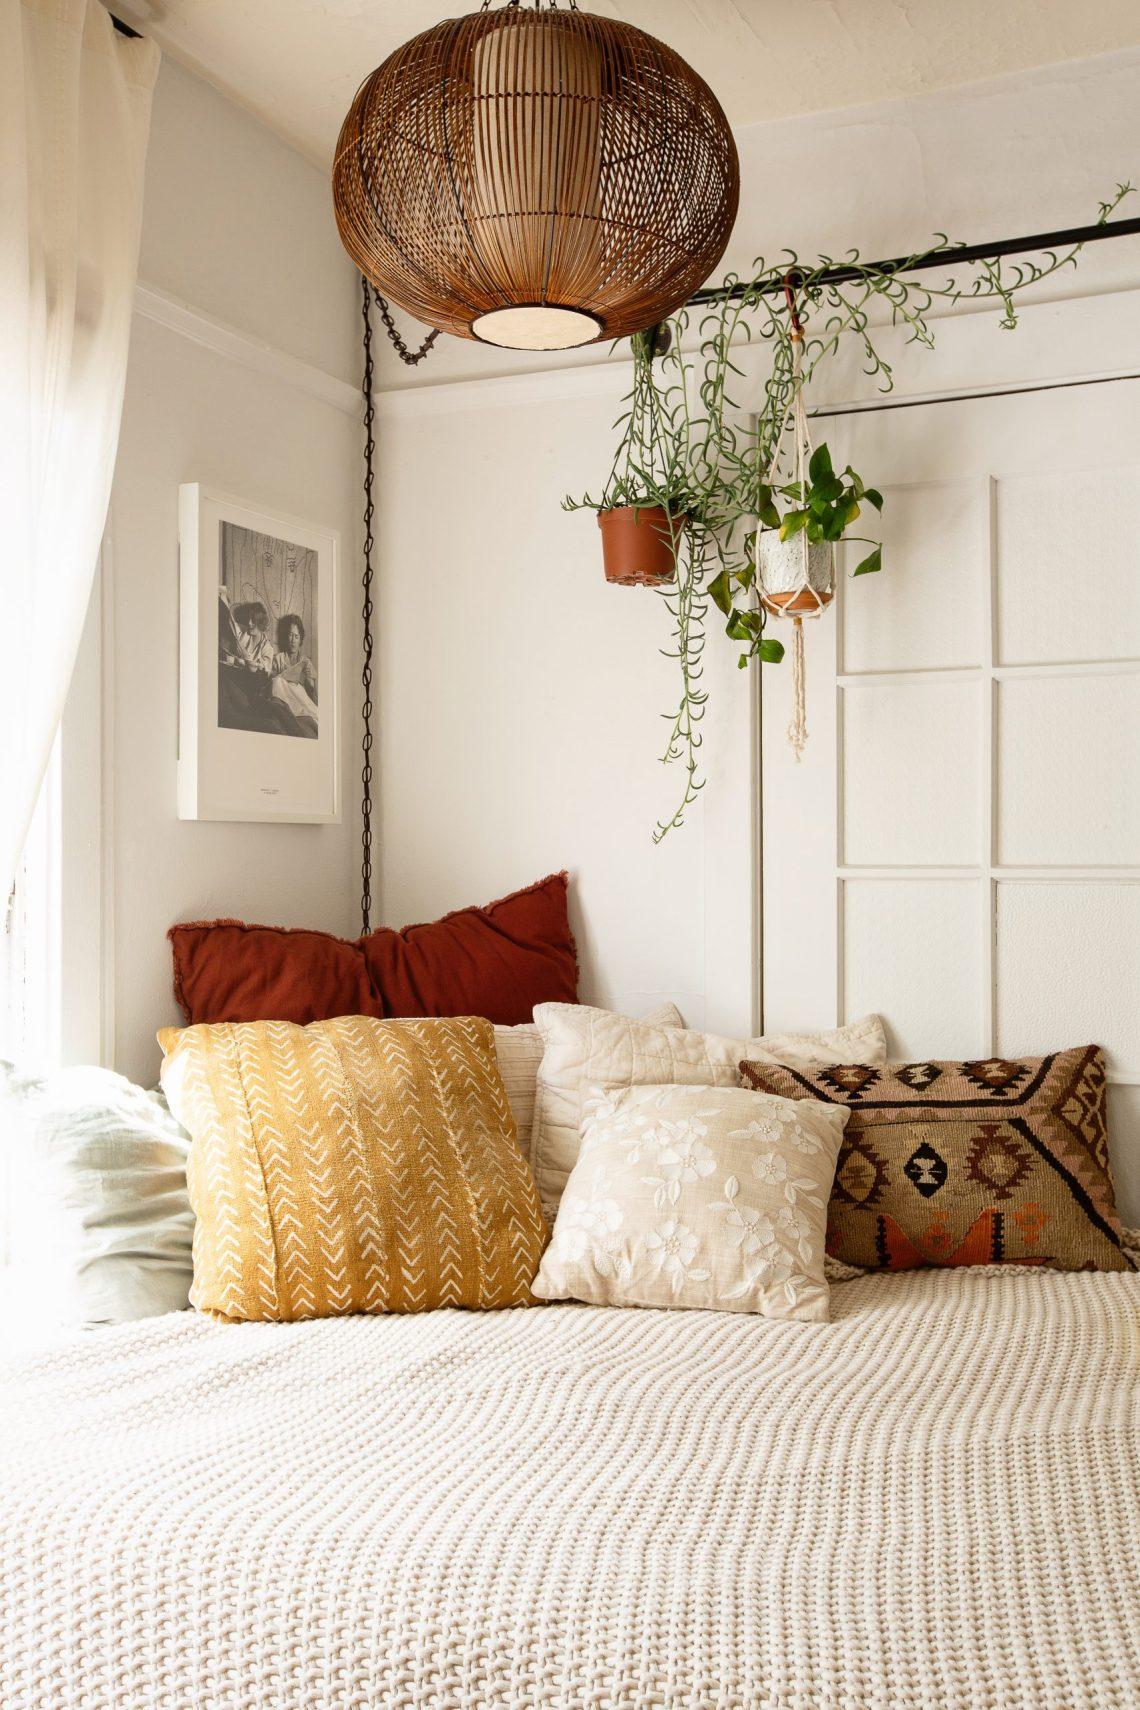 cozy bedroom nook by interior design artist Carrie Burch, Oakland CA